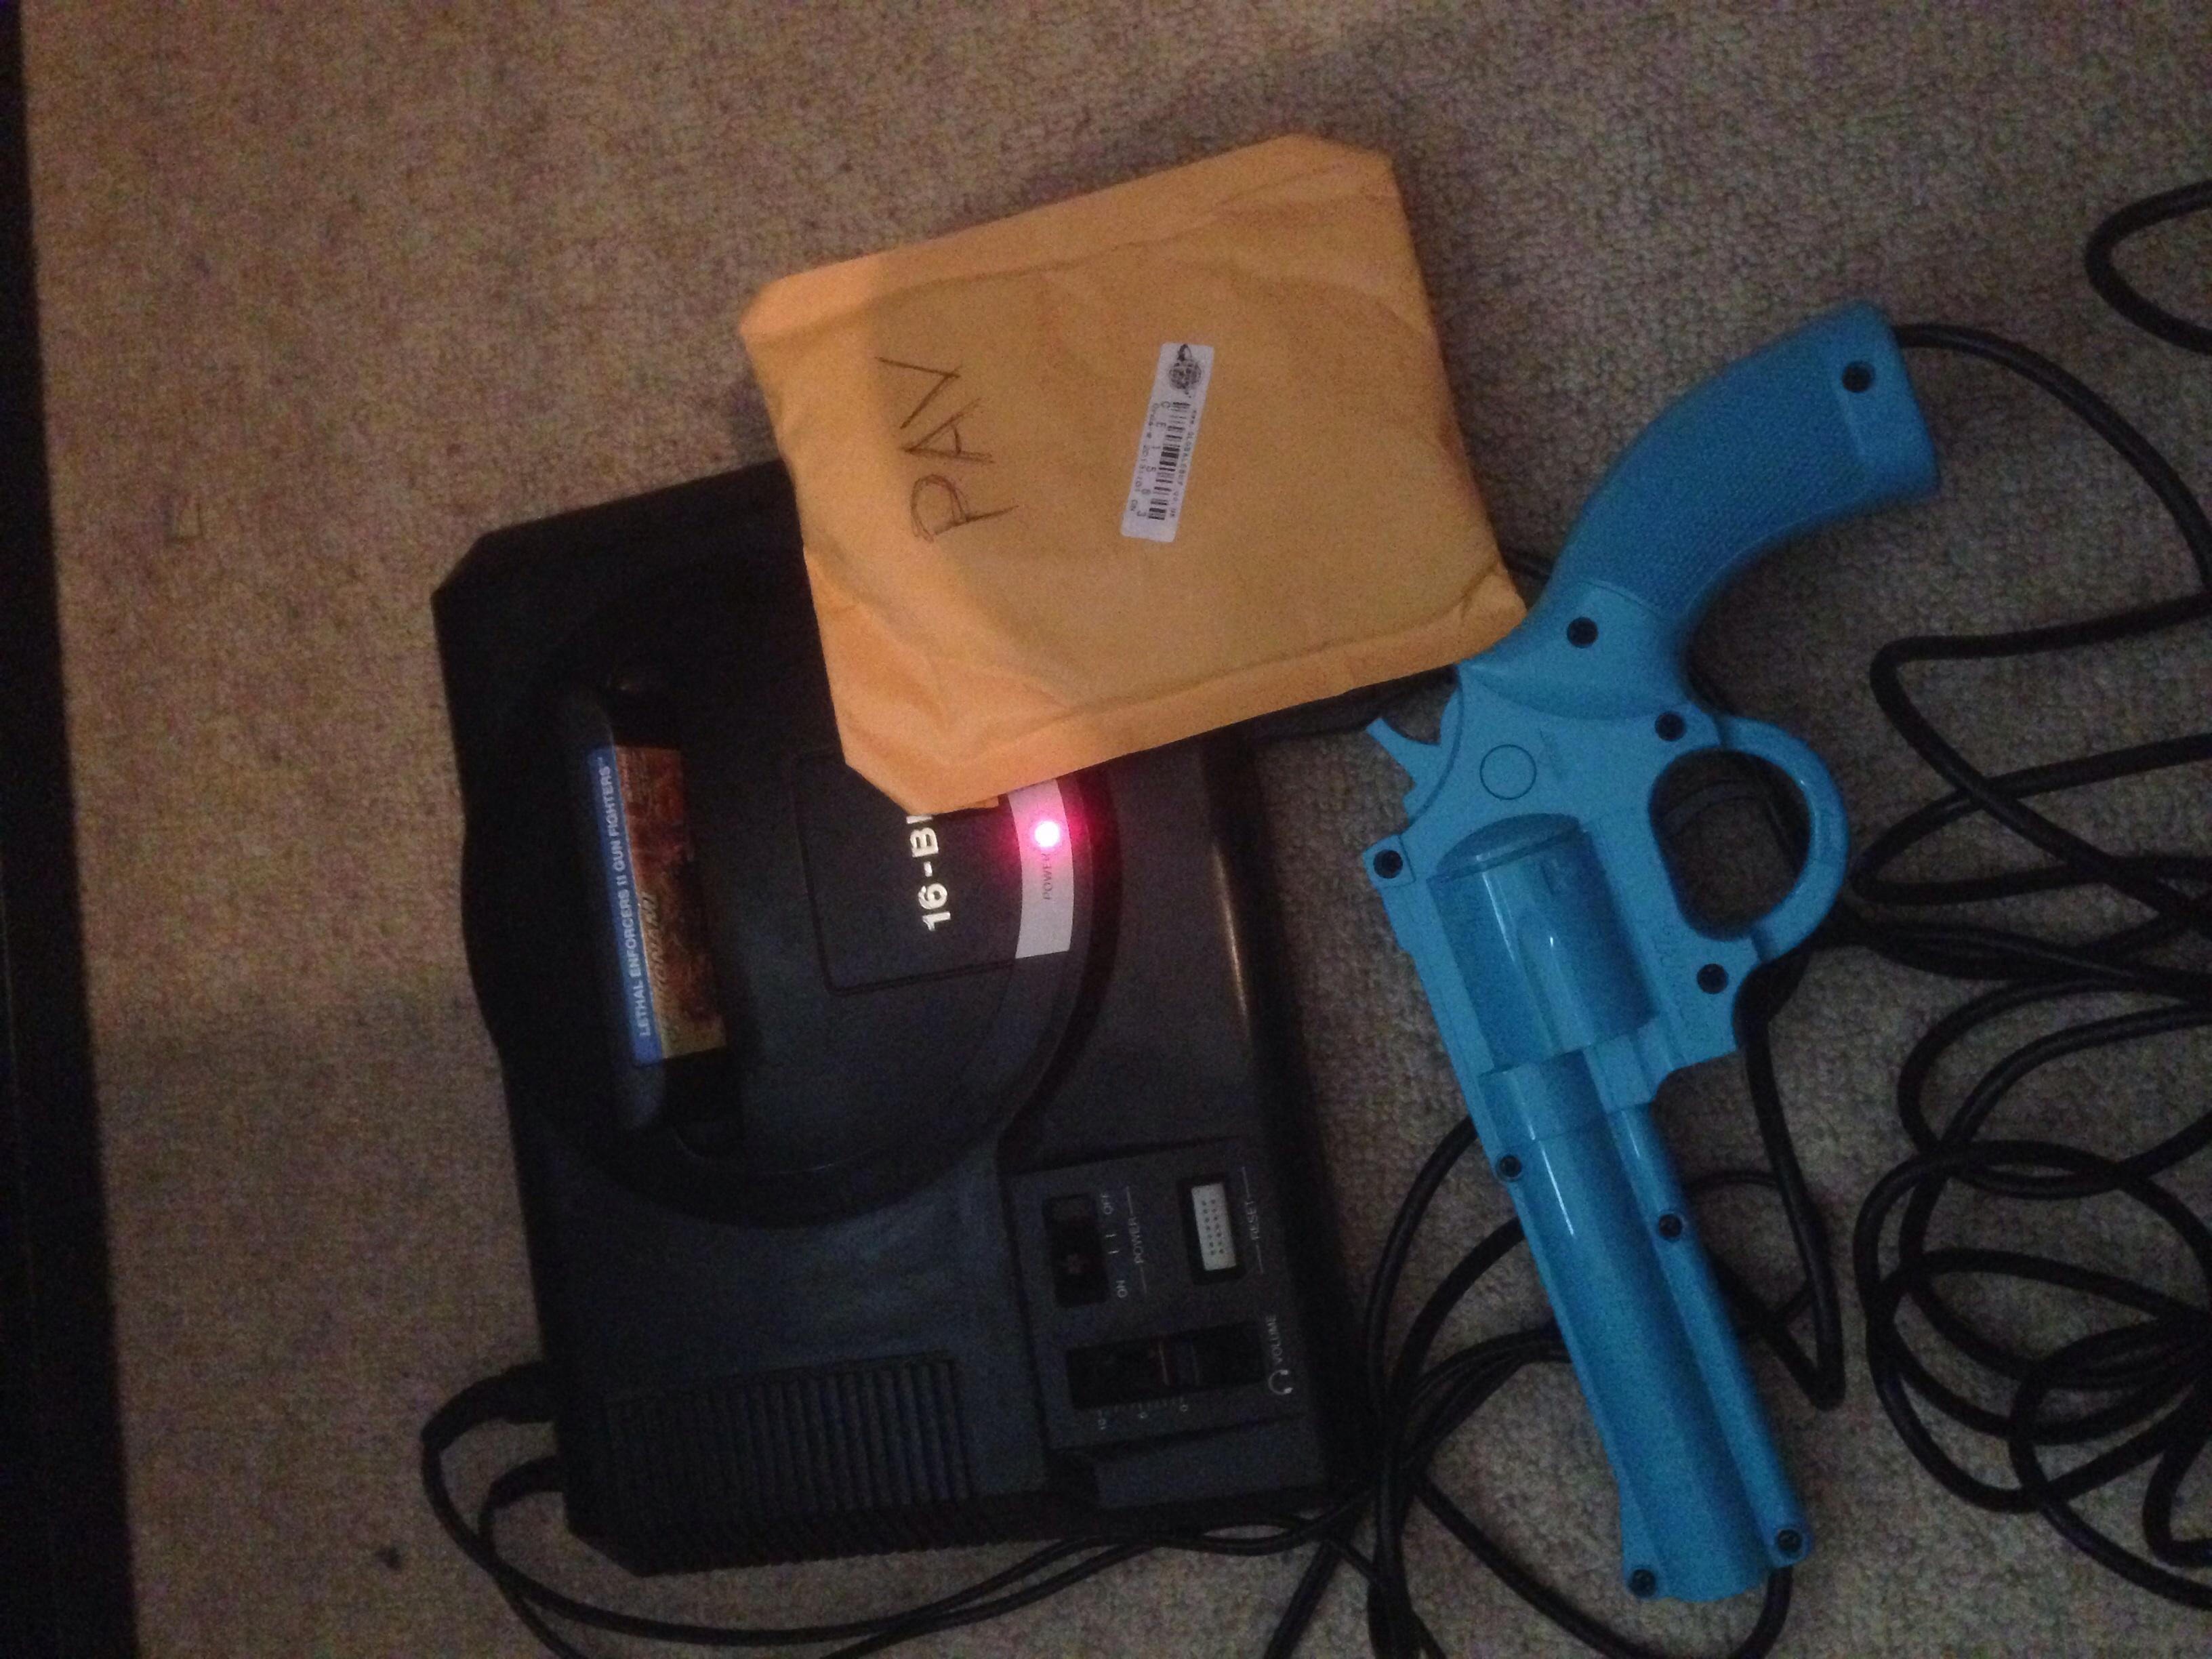 Lethal Enforcers II: Gun Fighters 976 points